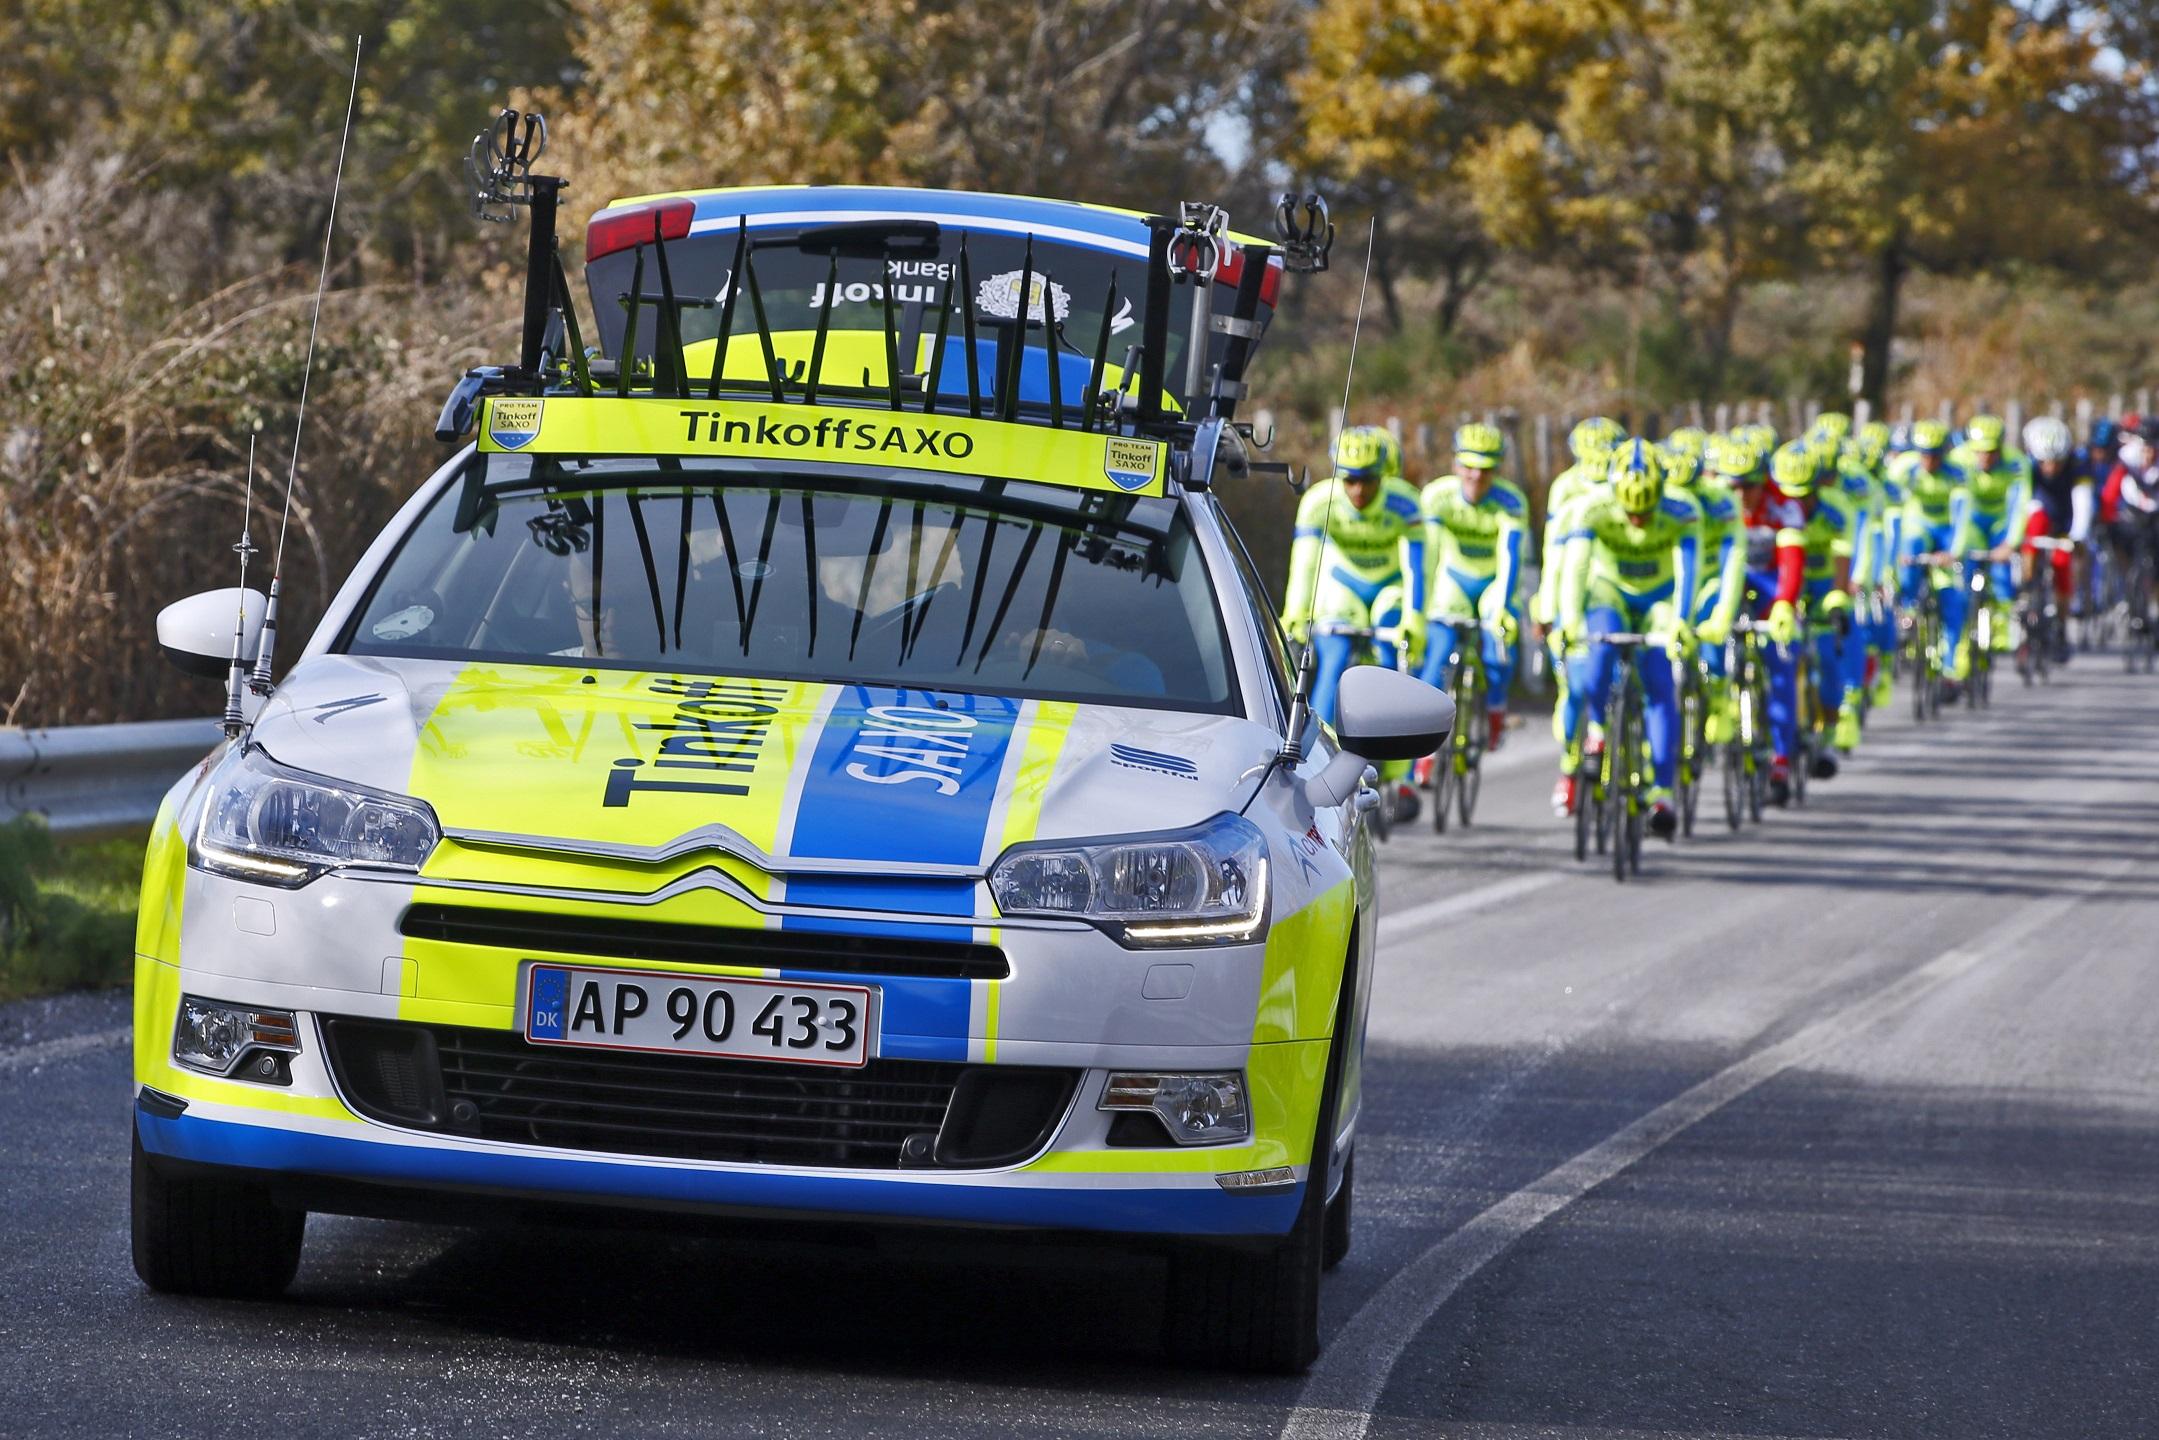 Citroen TINKOFF SAXO - Tour de France 2015